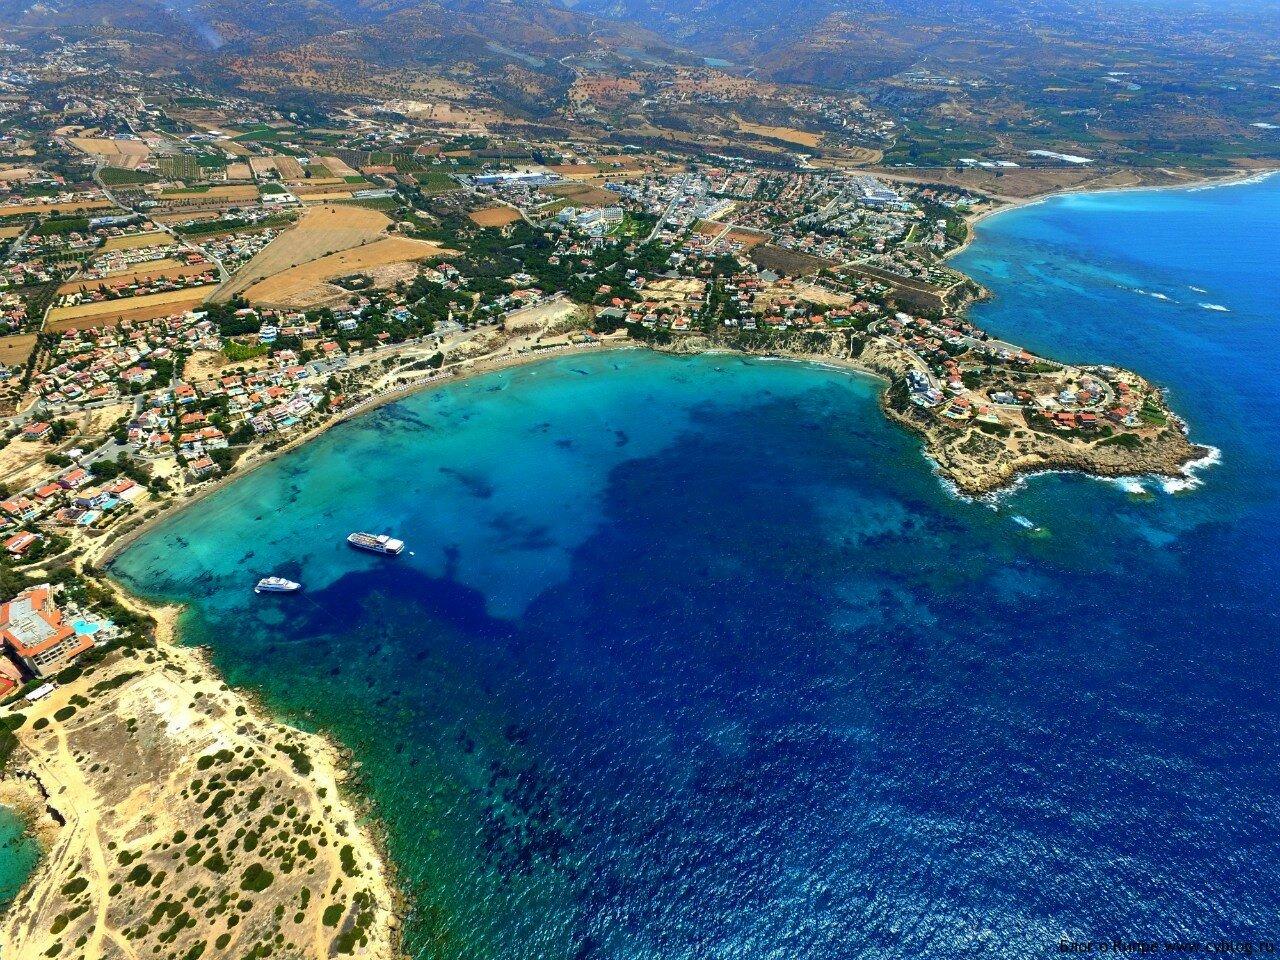 Кипр пляж корал бэй фото